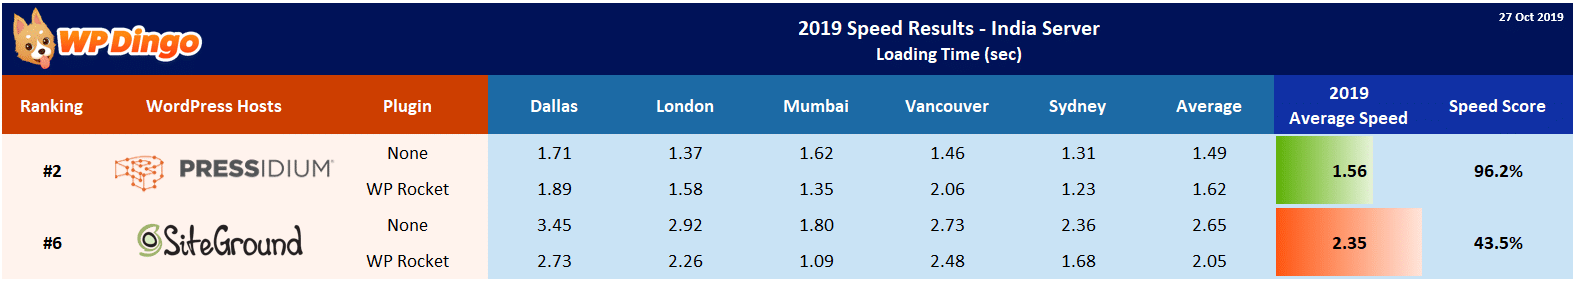 2019 Pressidium vs SiteGround Speed Table - India Server